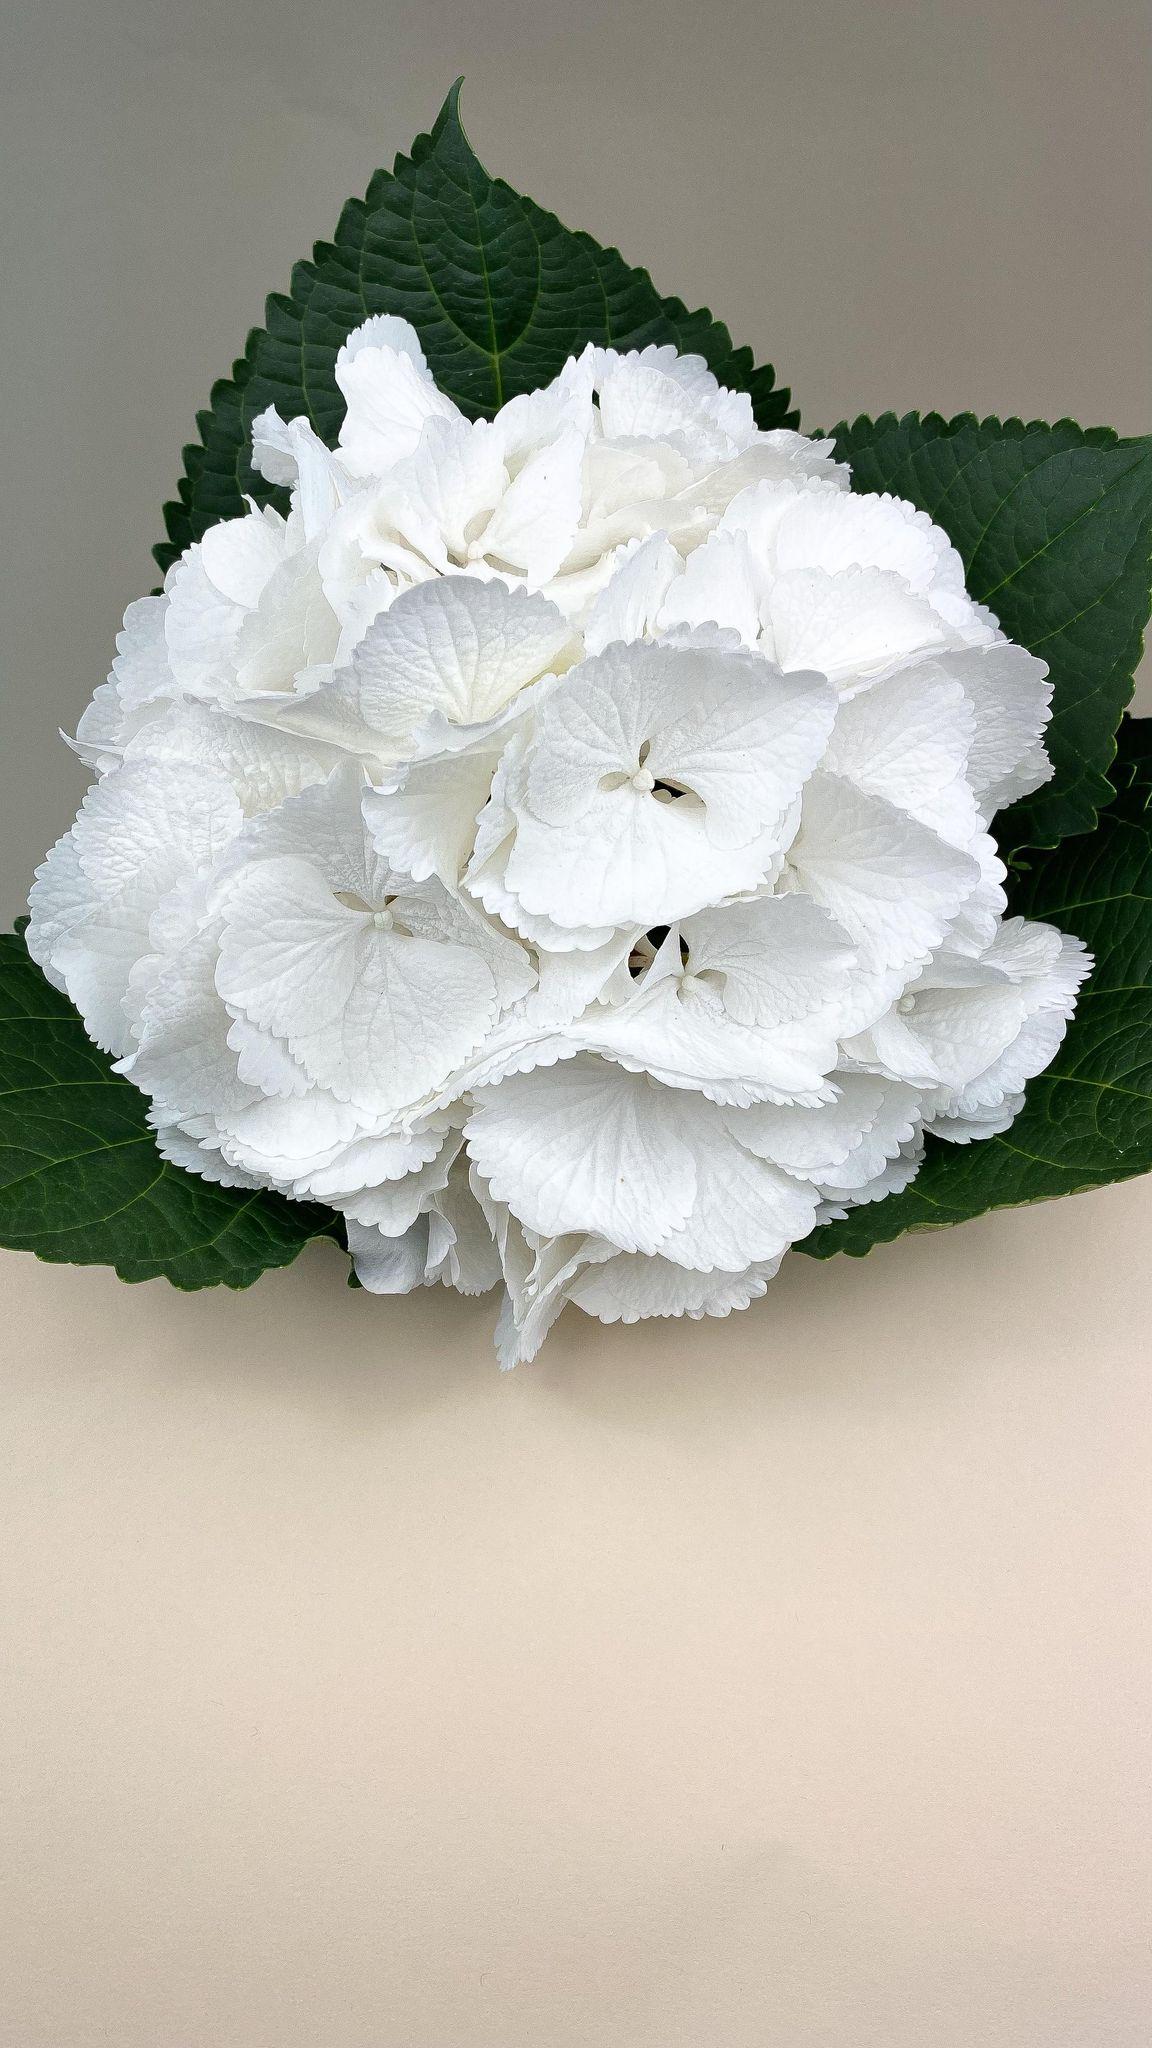 Hydrangea Snowball